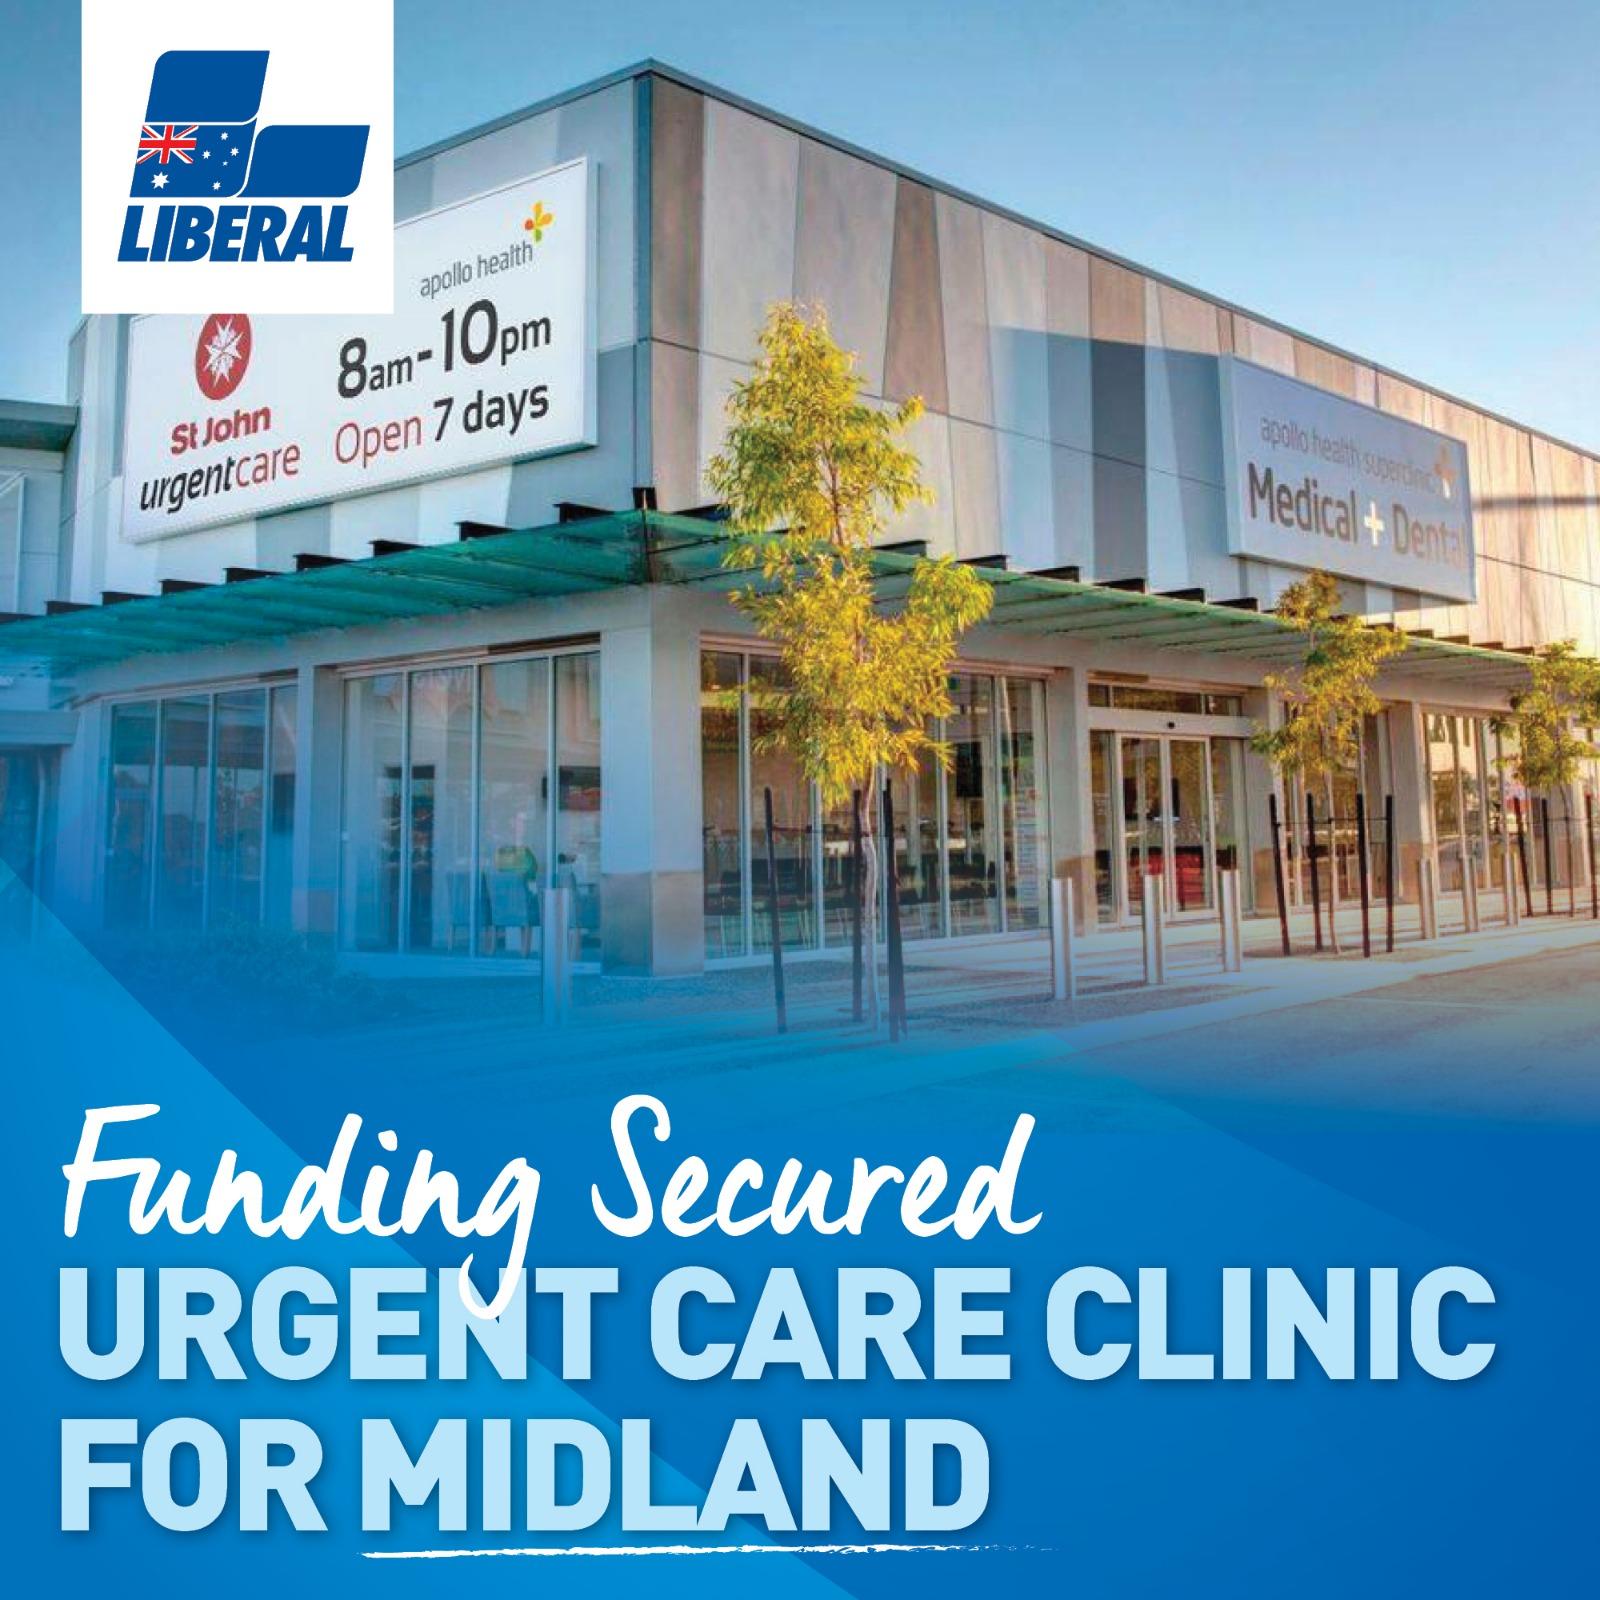 WyattK_Tile Midland Clinic.jpg